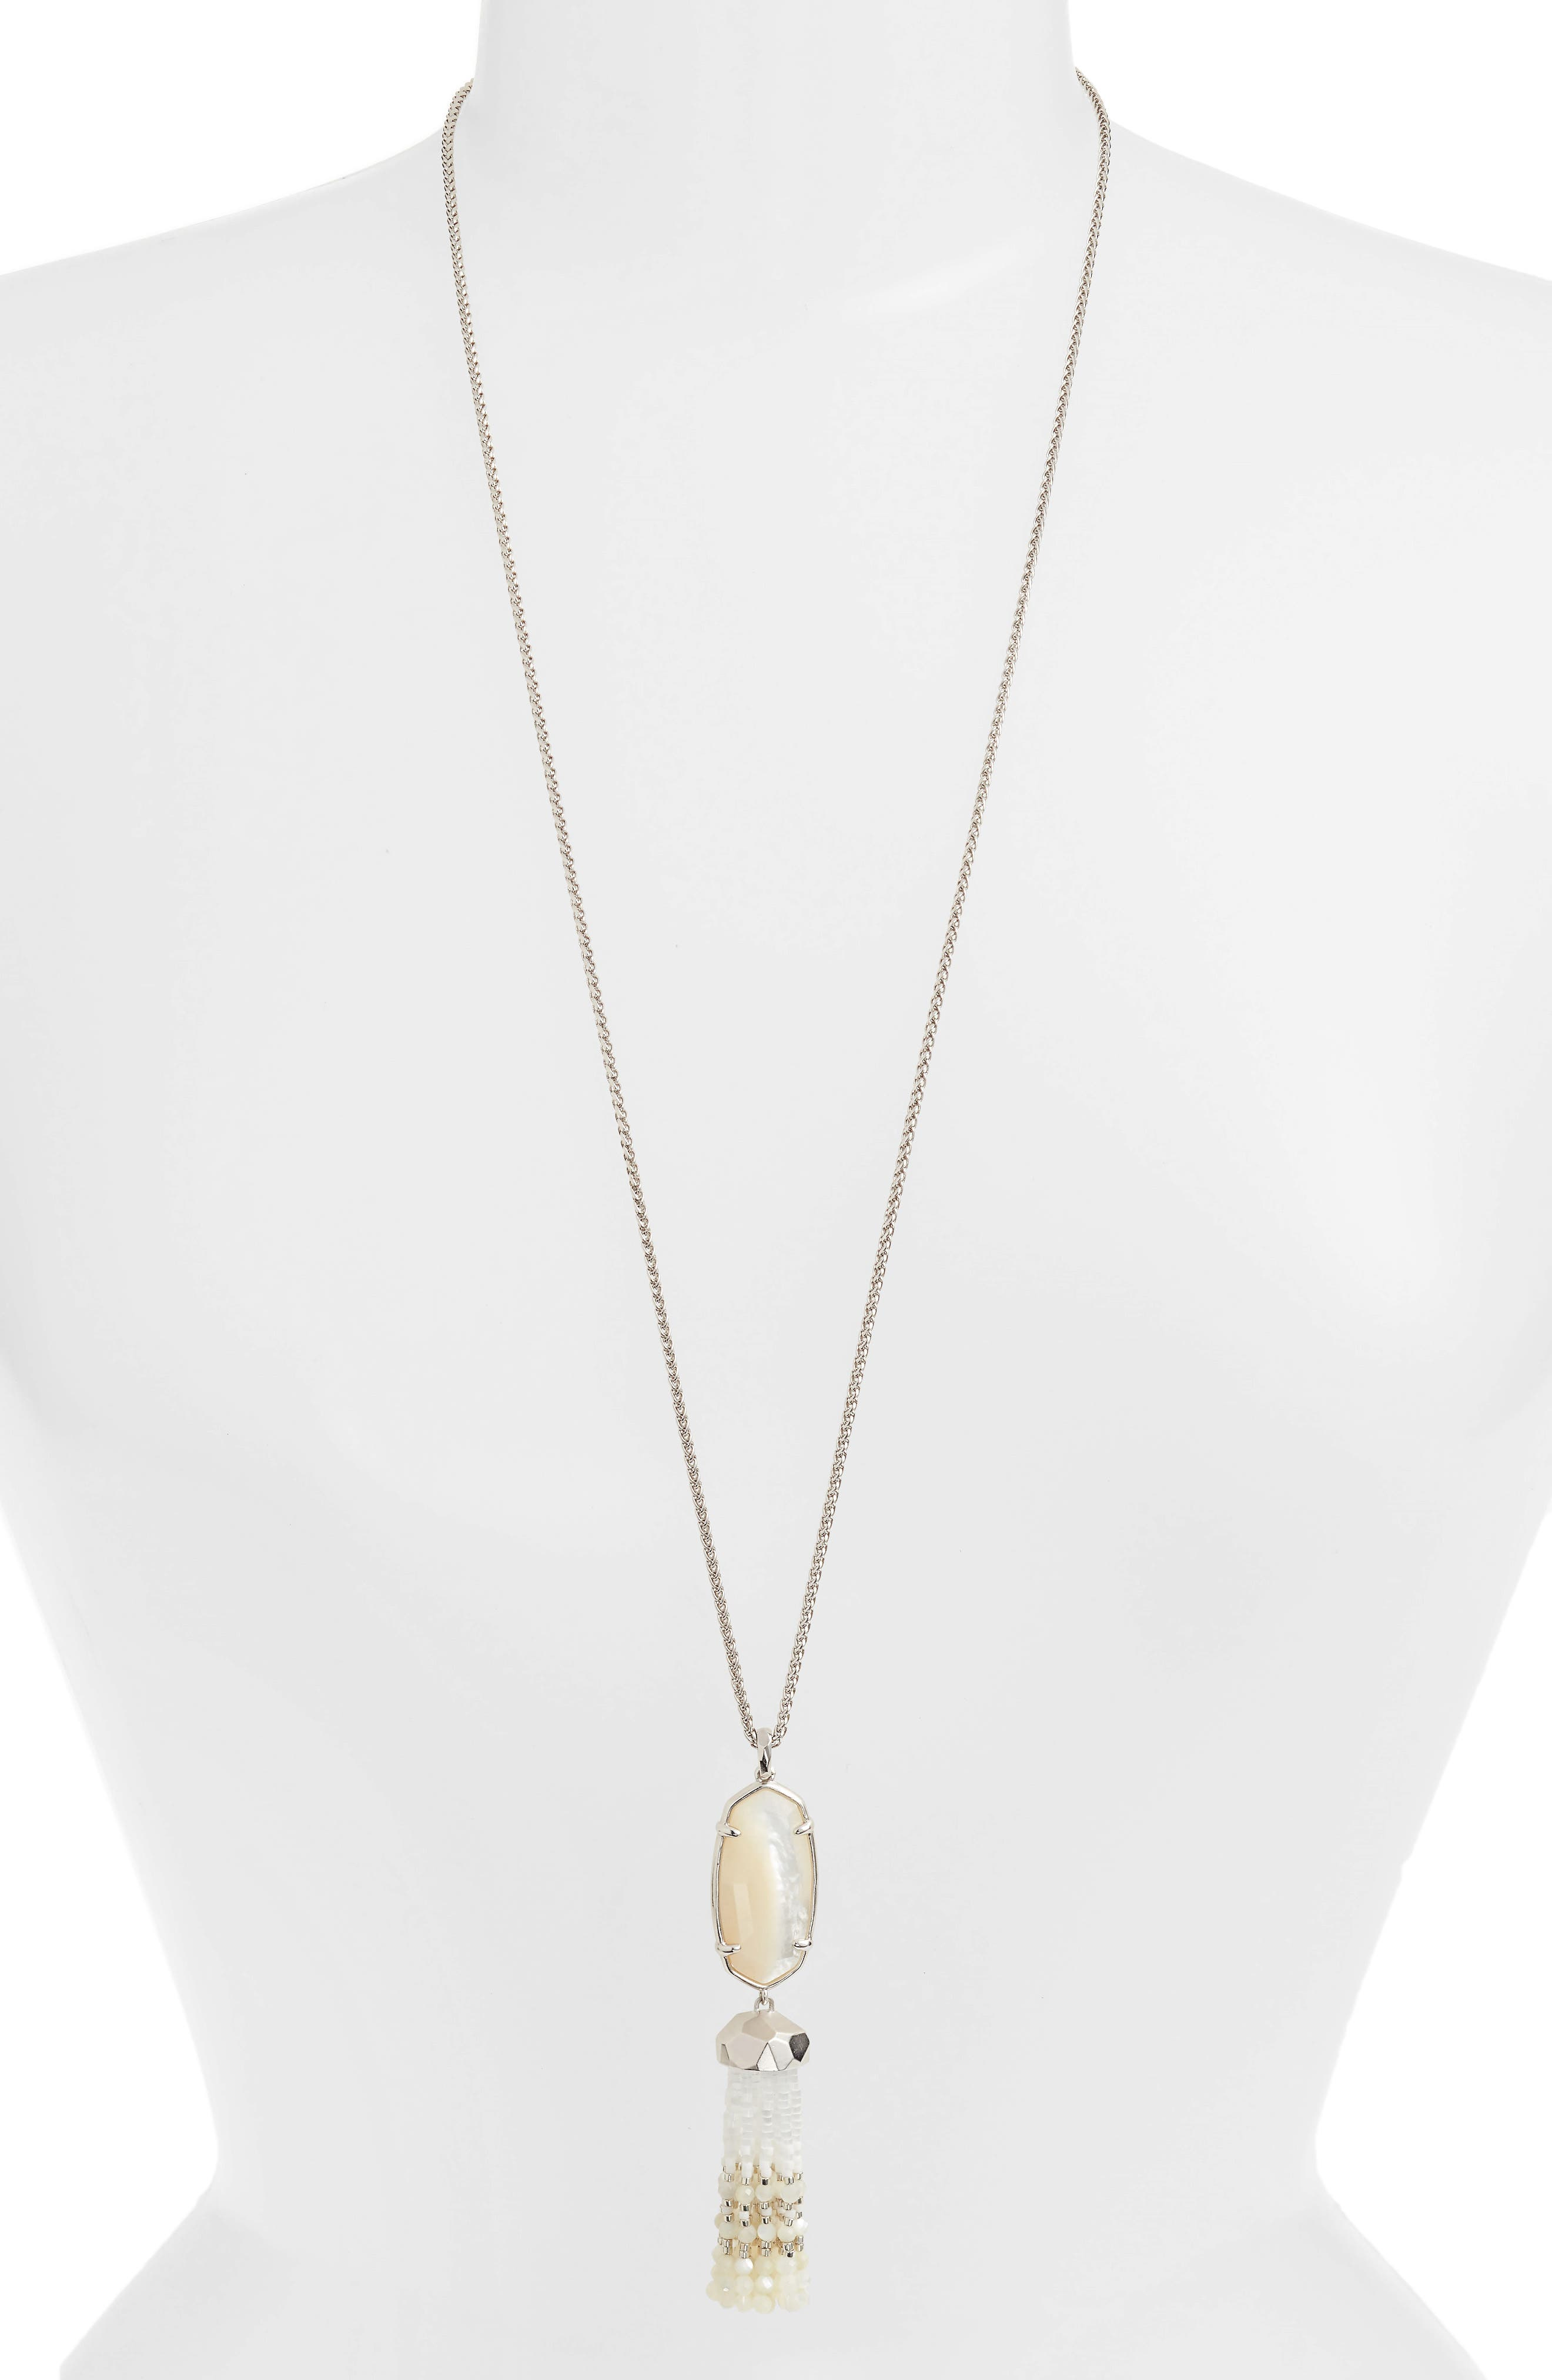 Eva Tassel Pendant Necklace,                             Main thumbnail 1, color,                             Ivory Mop/ Silver